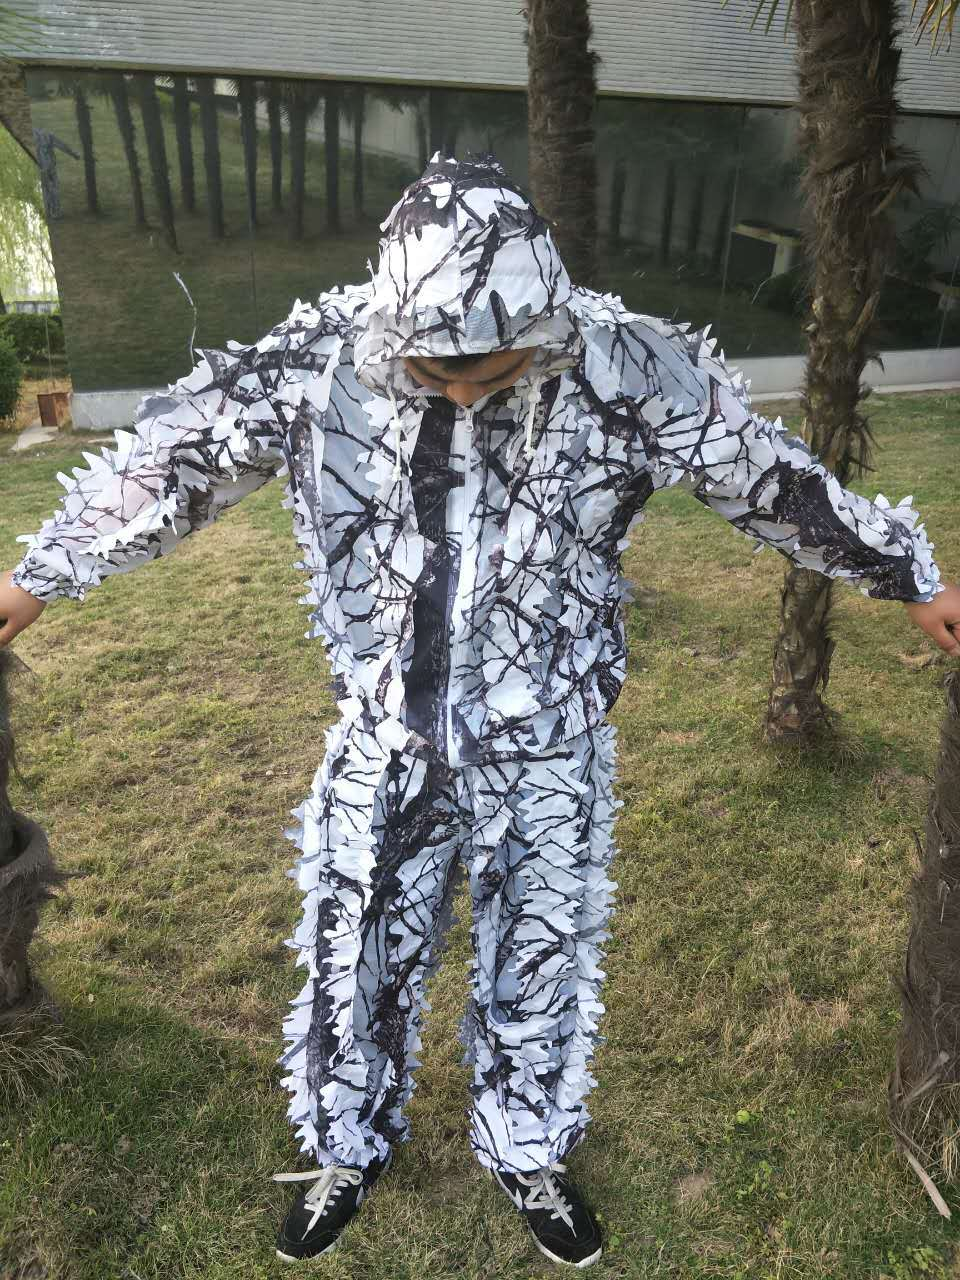 3D blanc neige prunier branches style camouflage ghillie costume bird watch airsoft chasse vêtements comprennent veste et pantalon